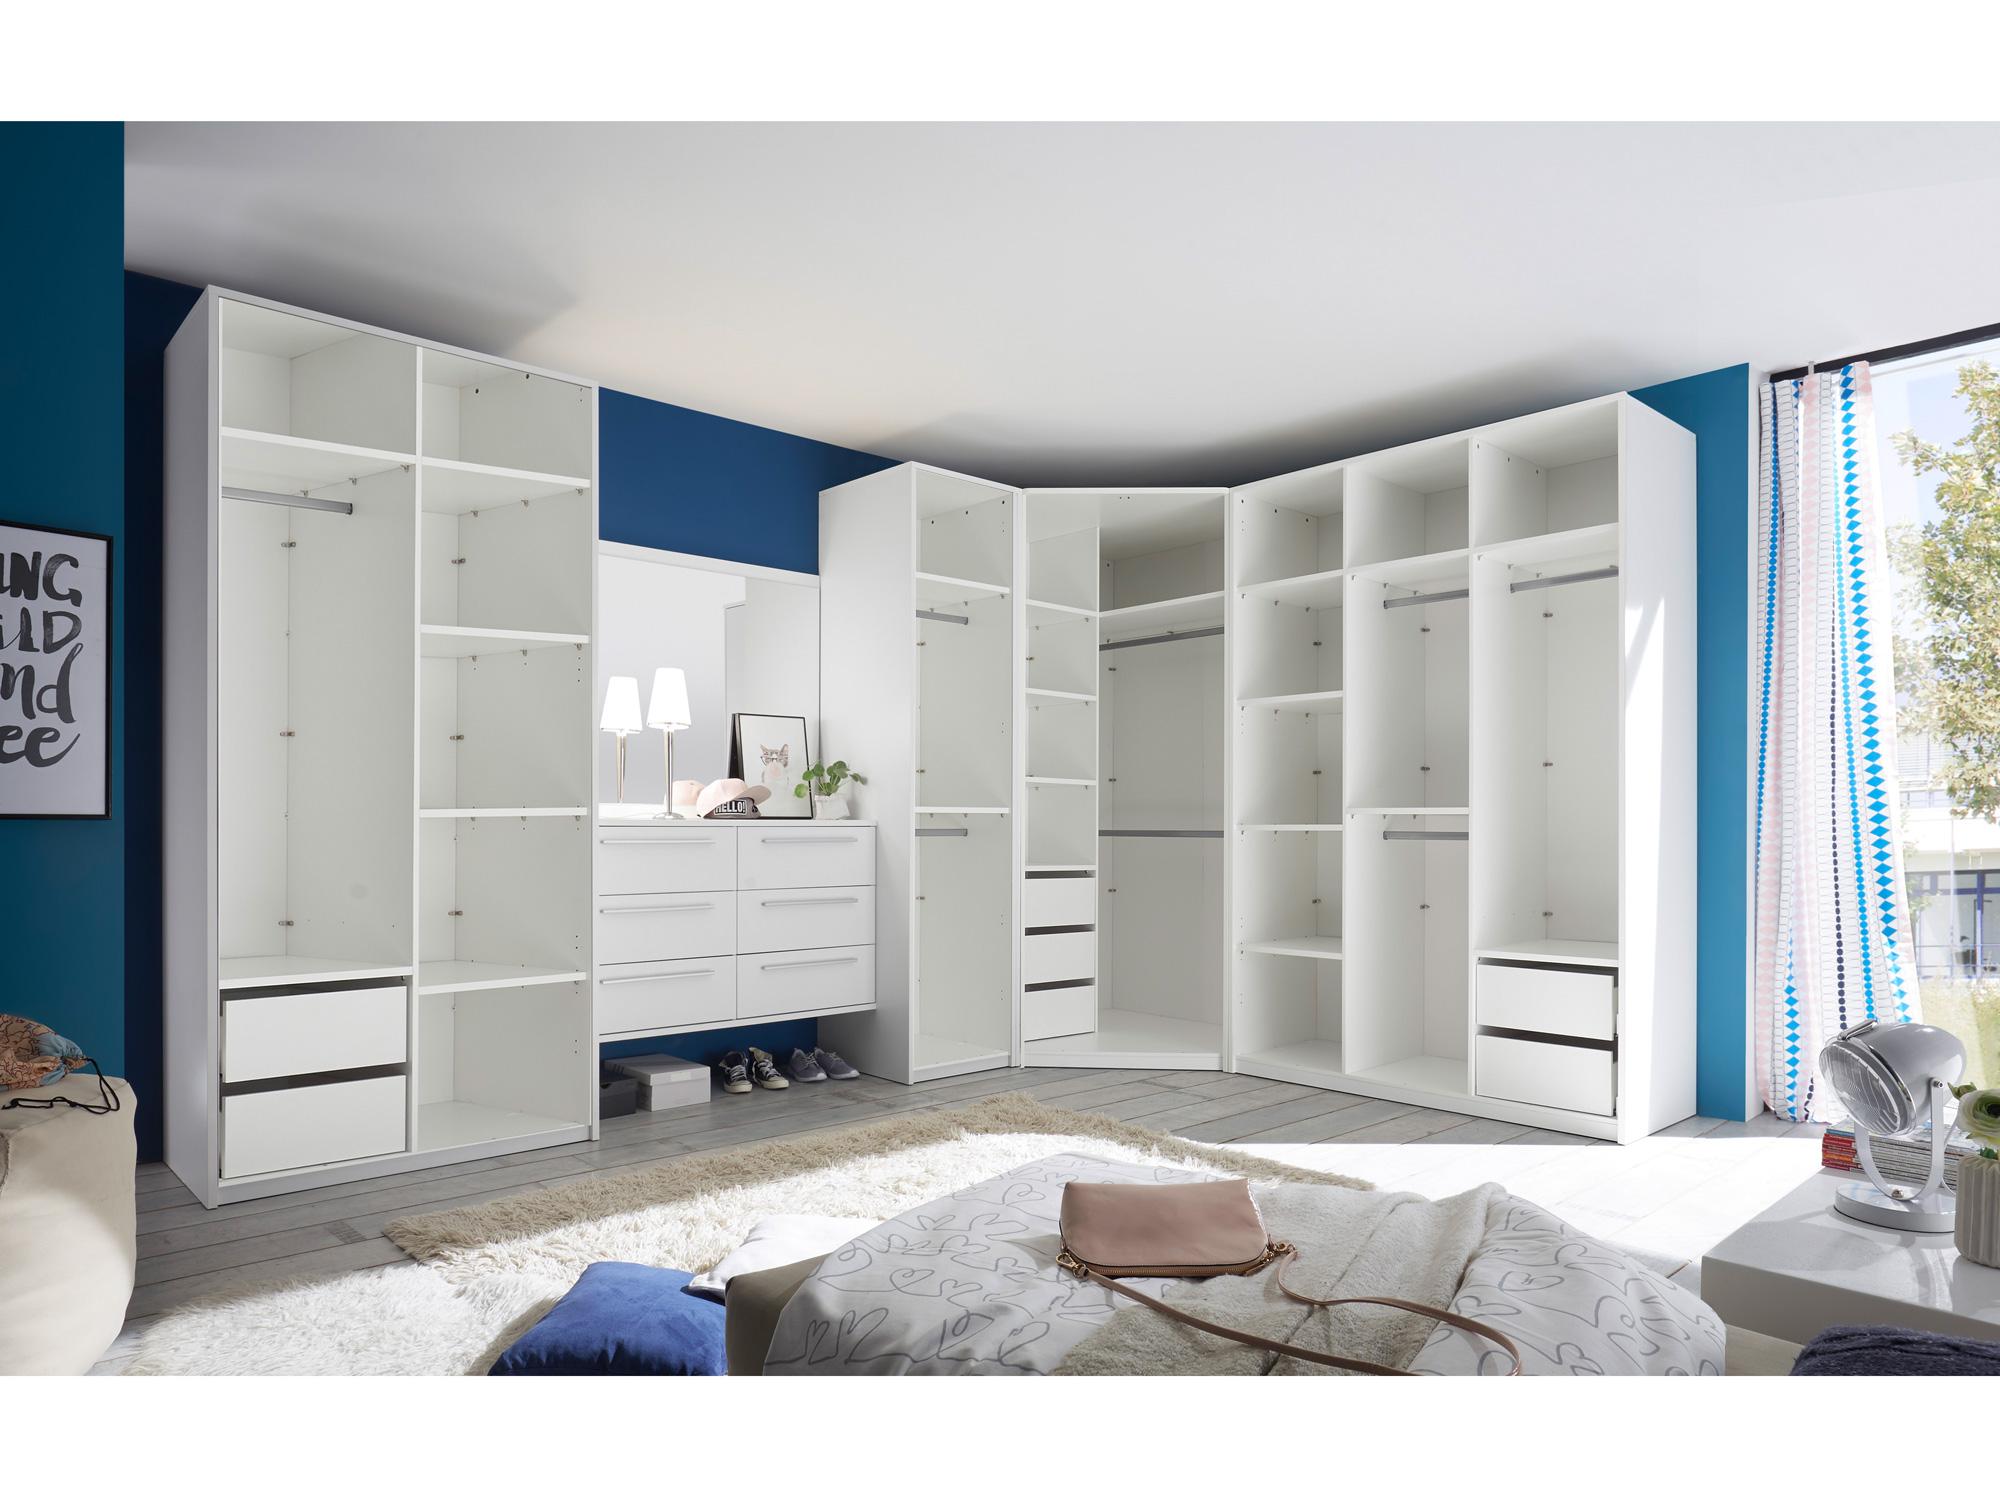 melbourne schlafzimmer begehbarer kleiderschrank ohne. Black Bedroom Furniture Sets. Home Design Ideas